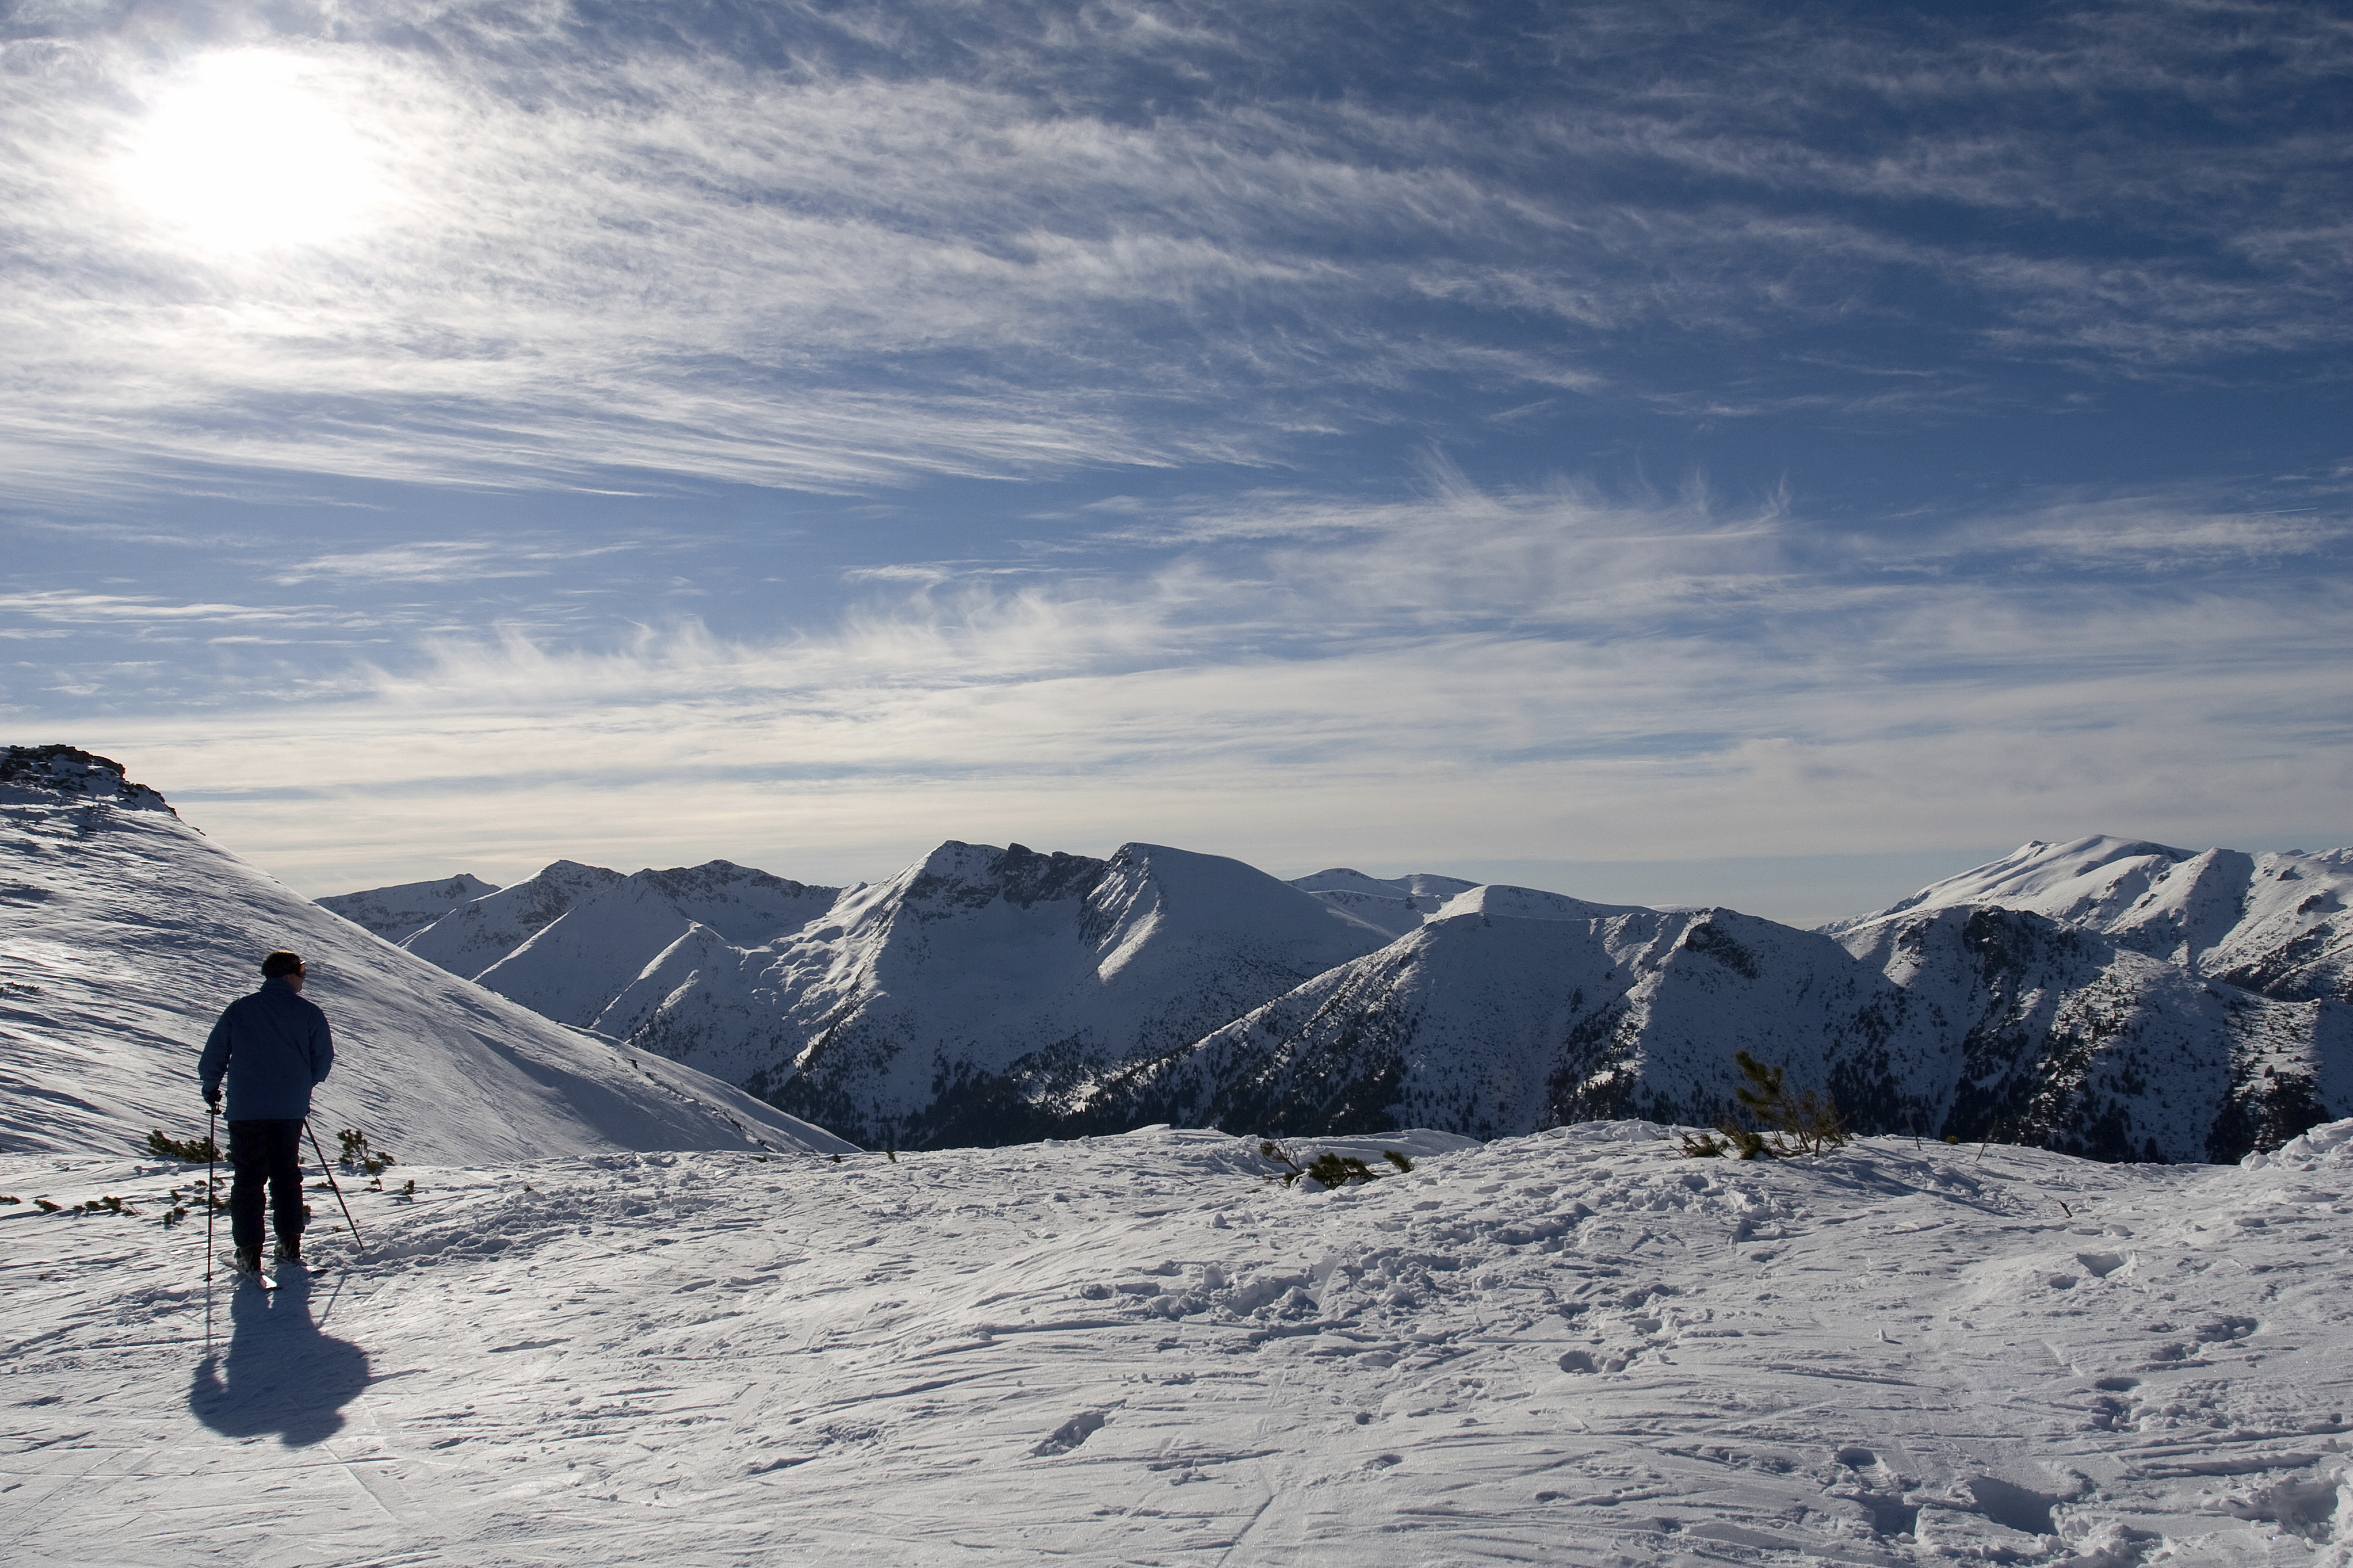 Bulgaria's ski resorts are growing fast